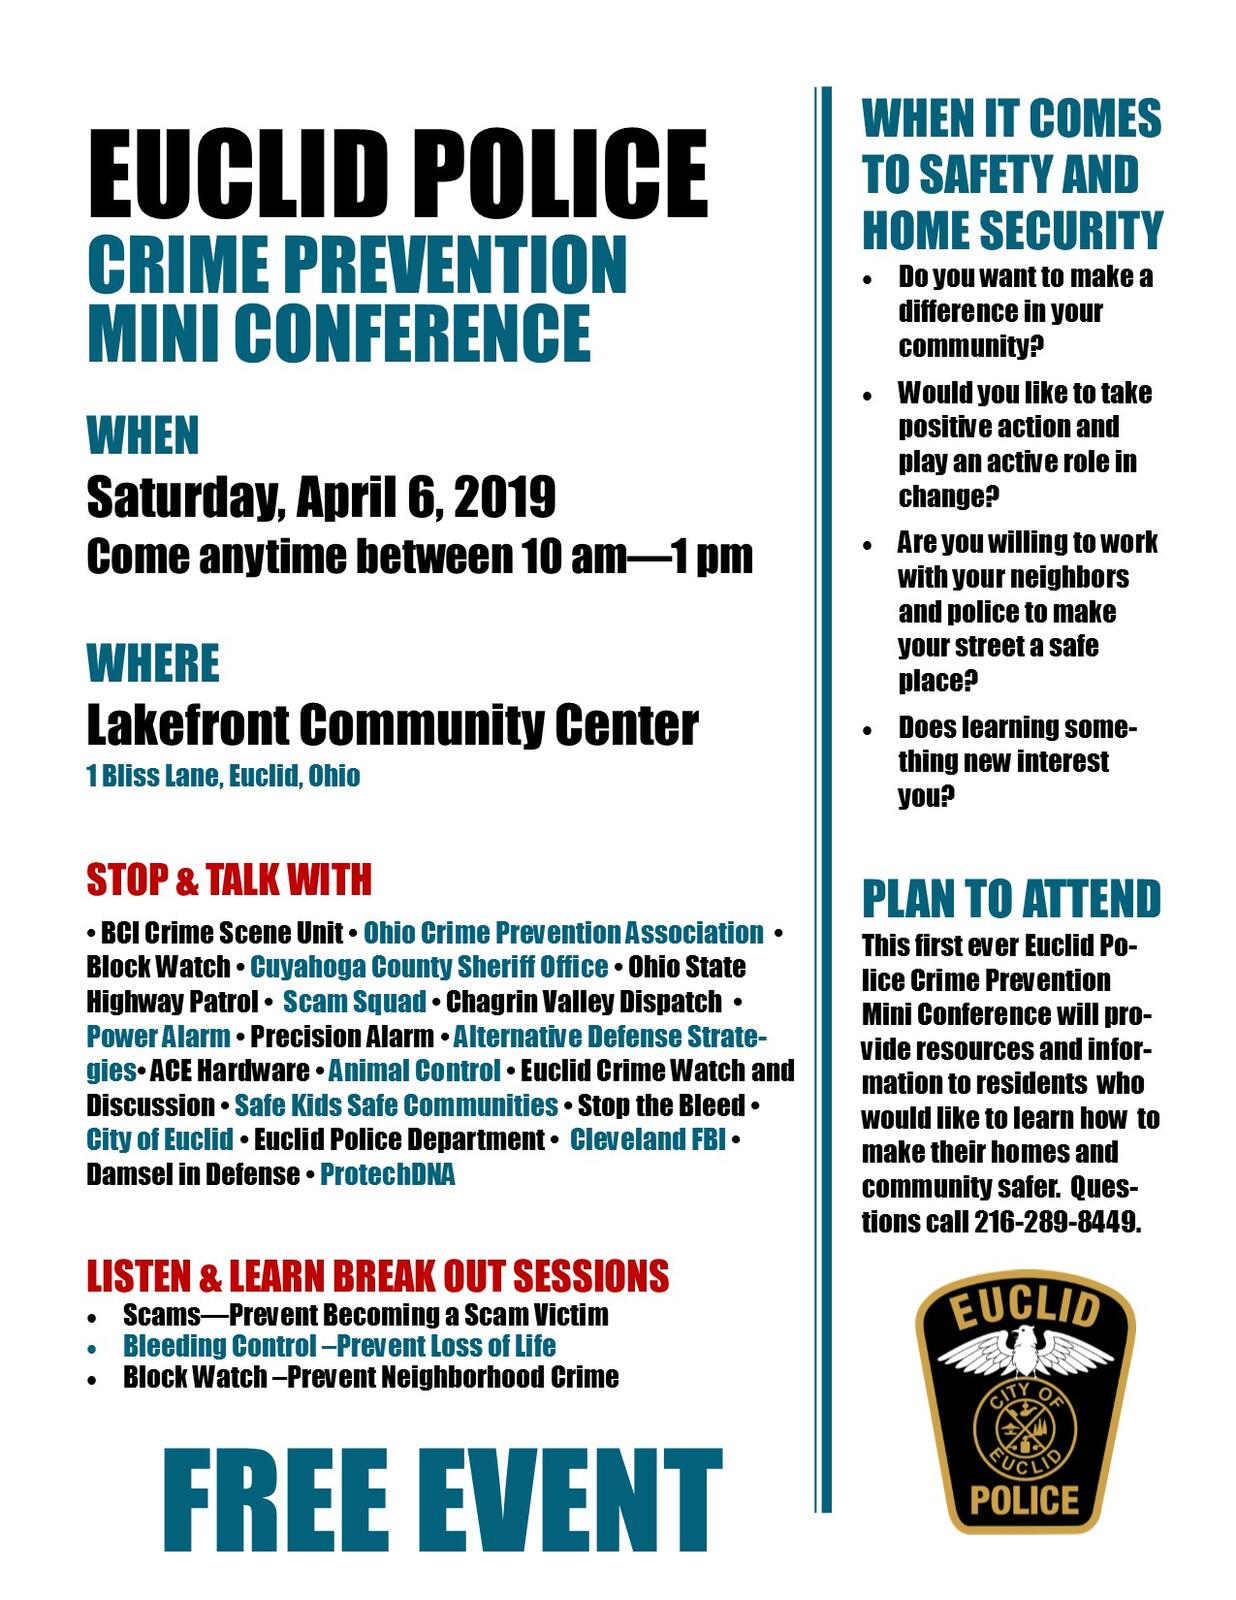 Crime Prevention Conference April 6 (Euclid Police